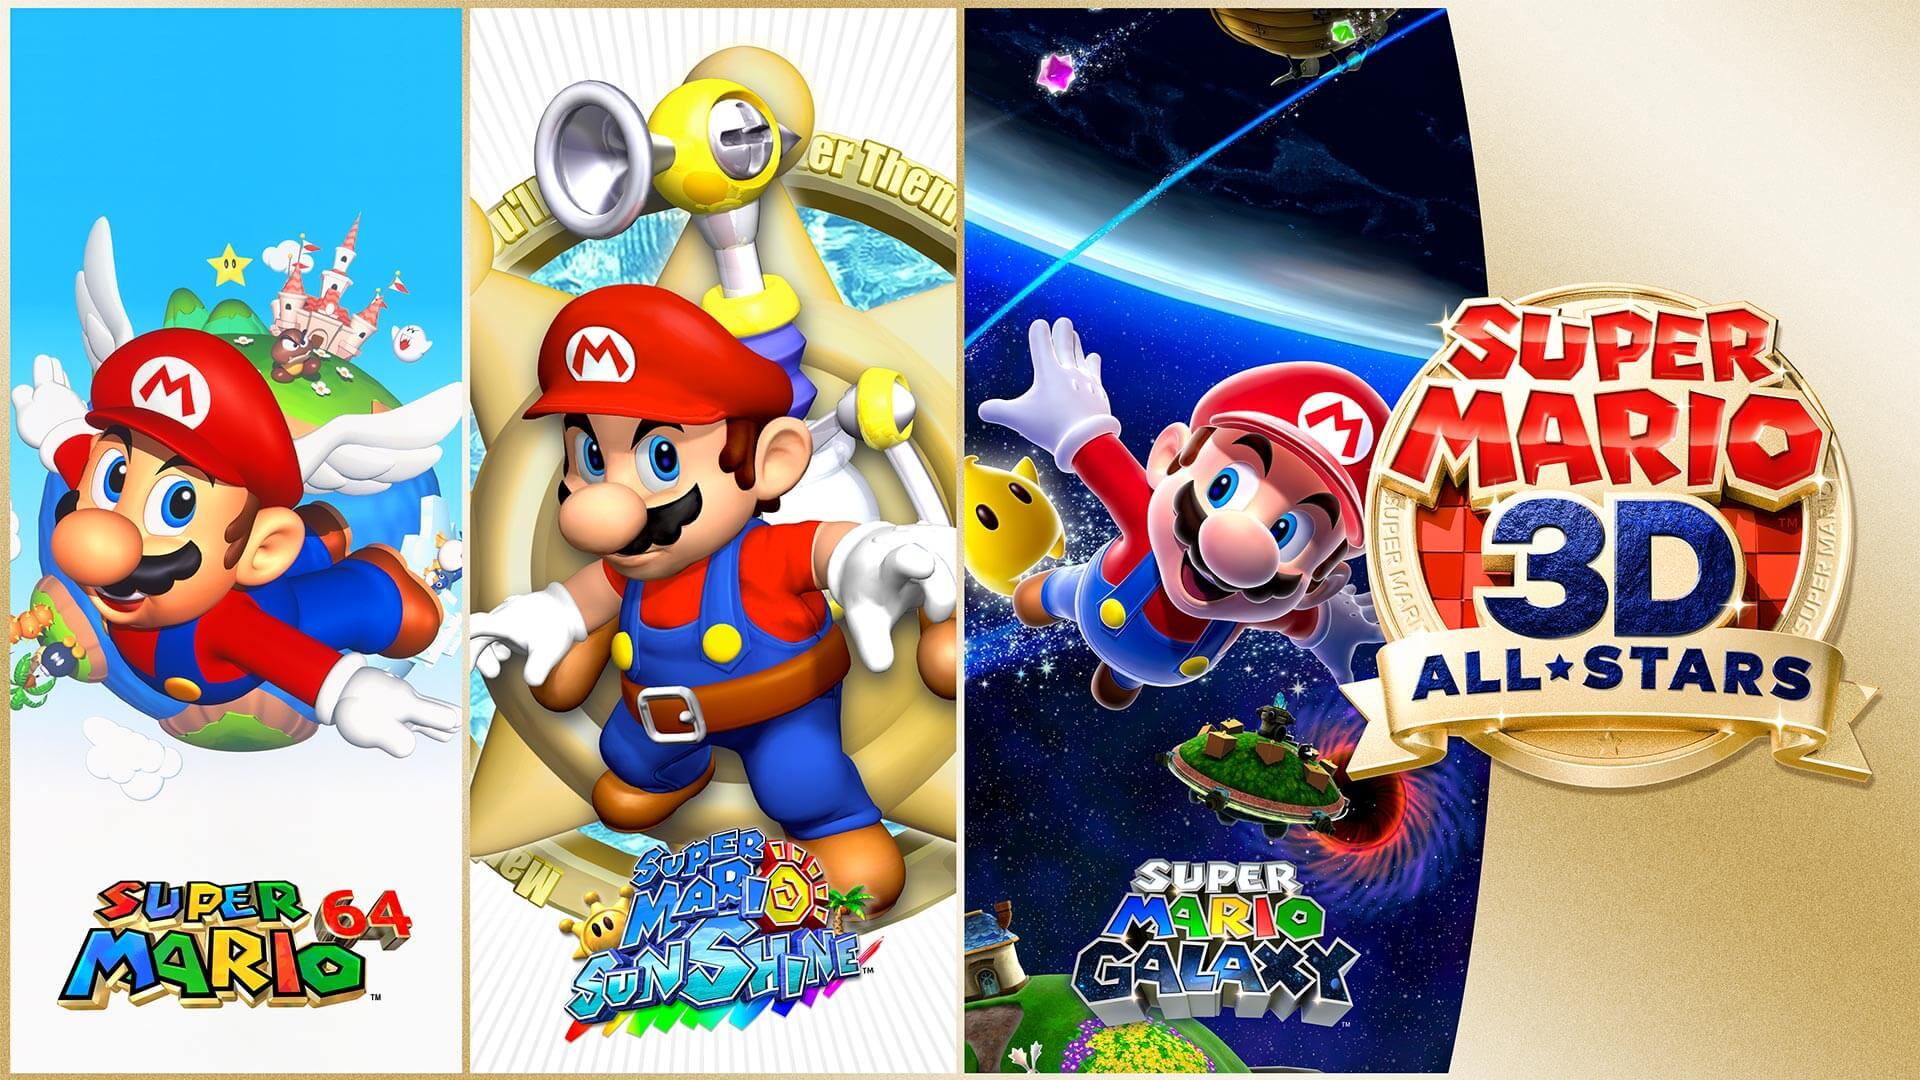 Super Mario 3D All-Stars Free PC Download